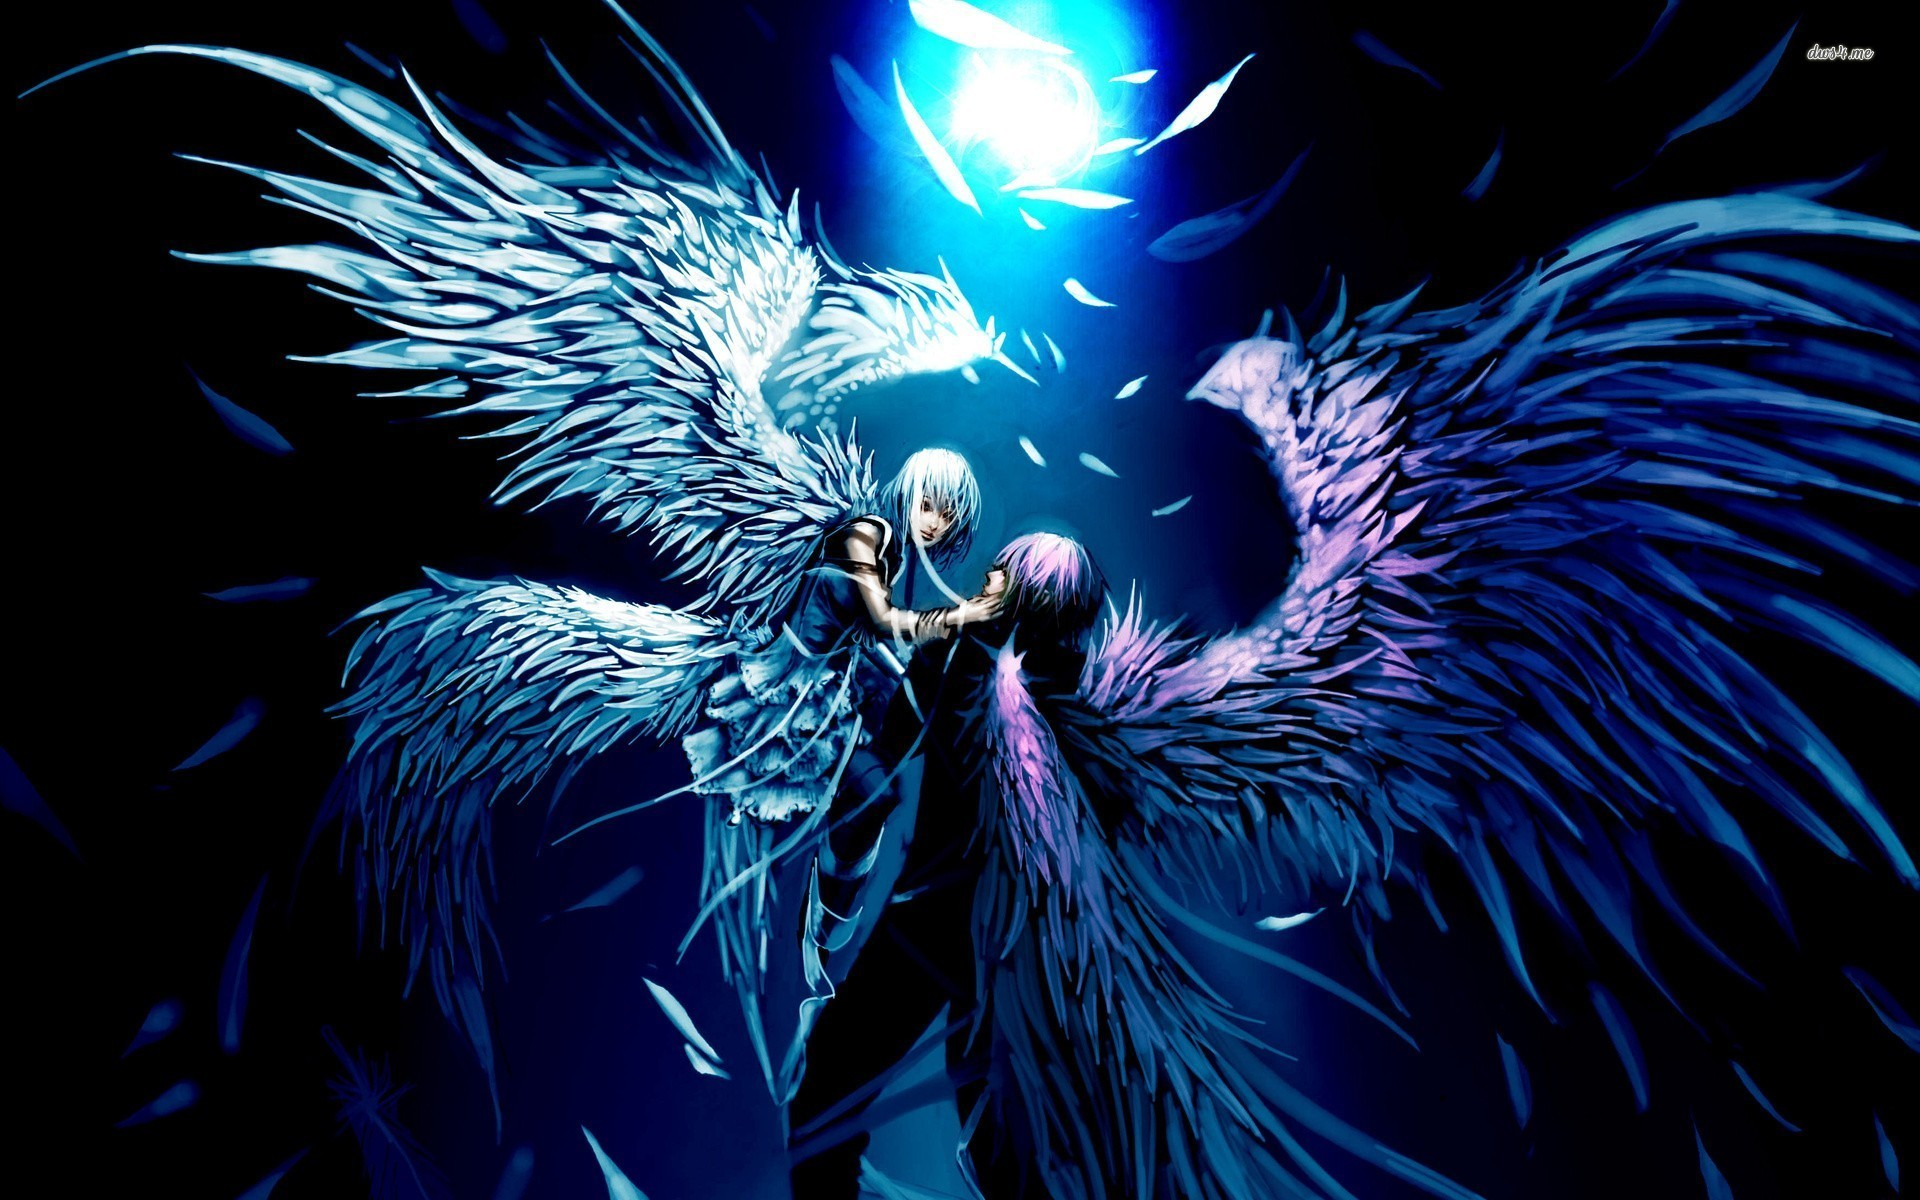 Angel And Demon Lovers Anime Desktop Background   HD .